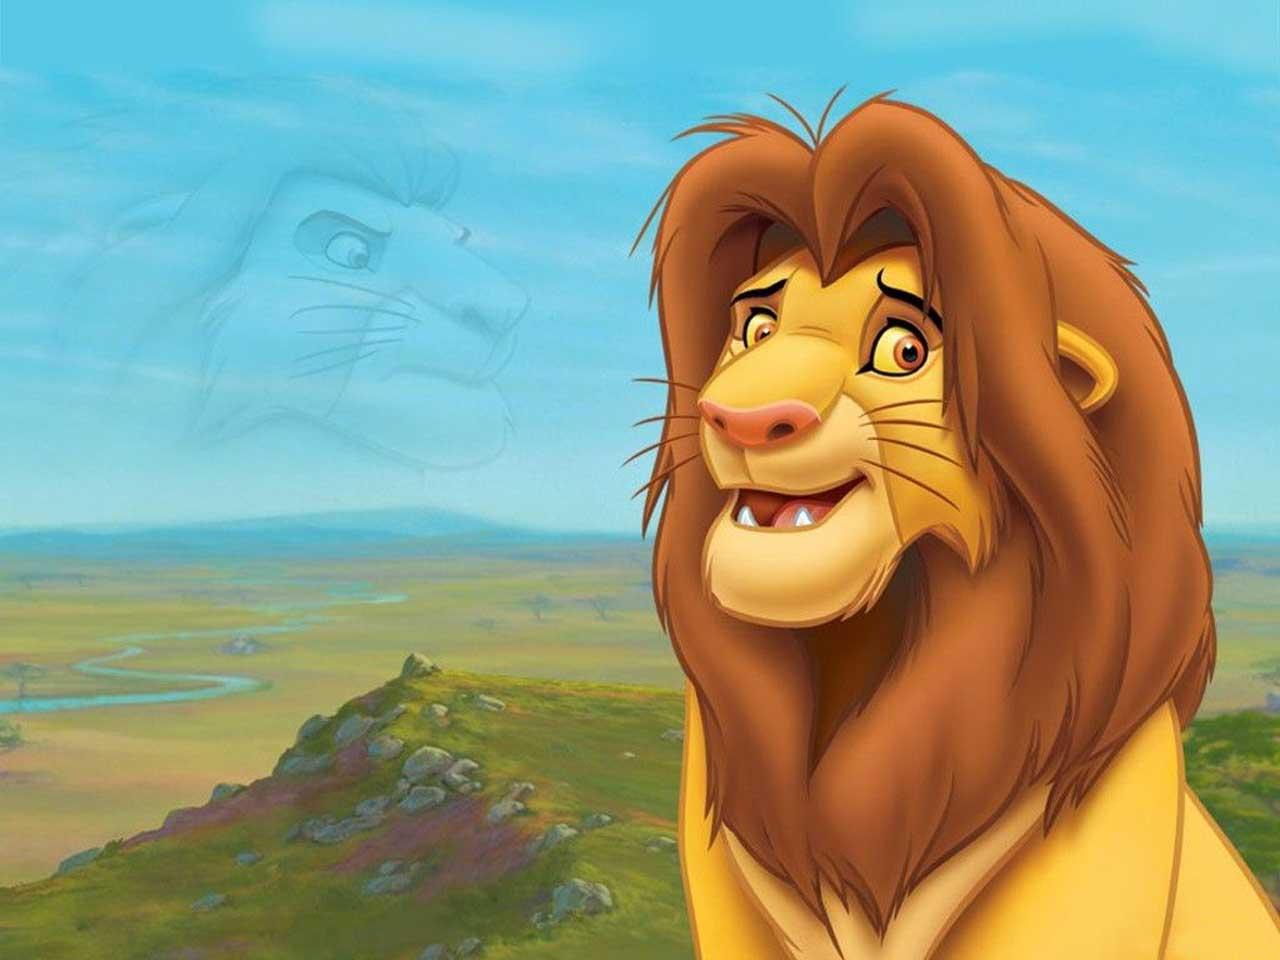 lion cartoon drawings wallpaper - photo #1